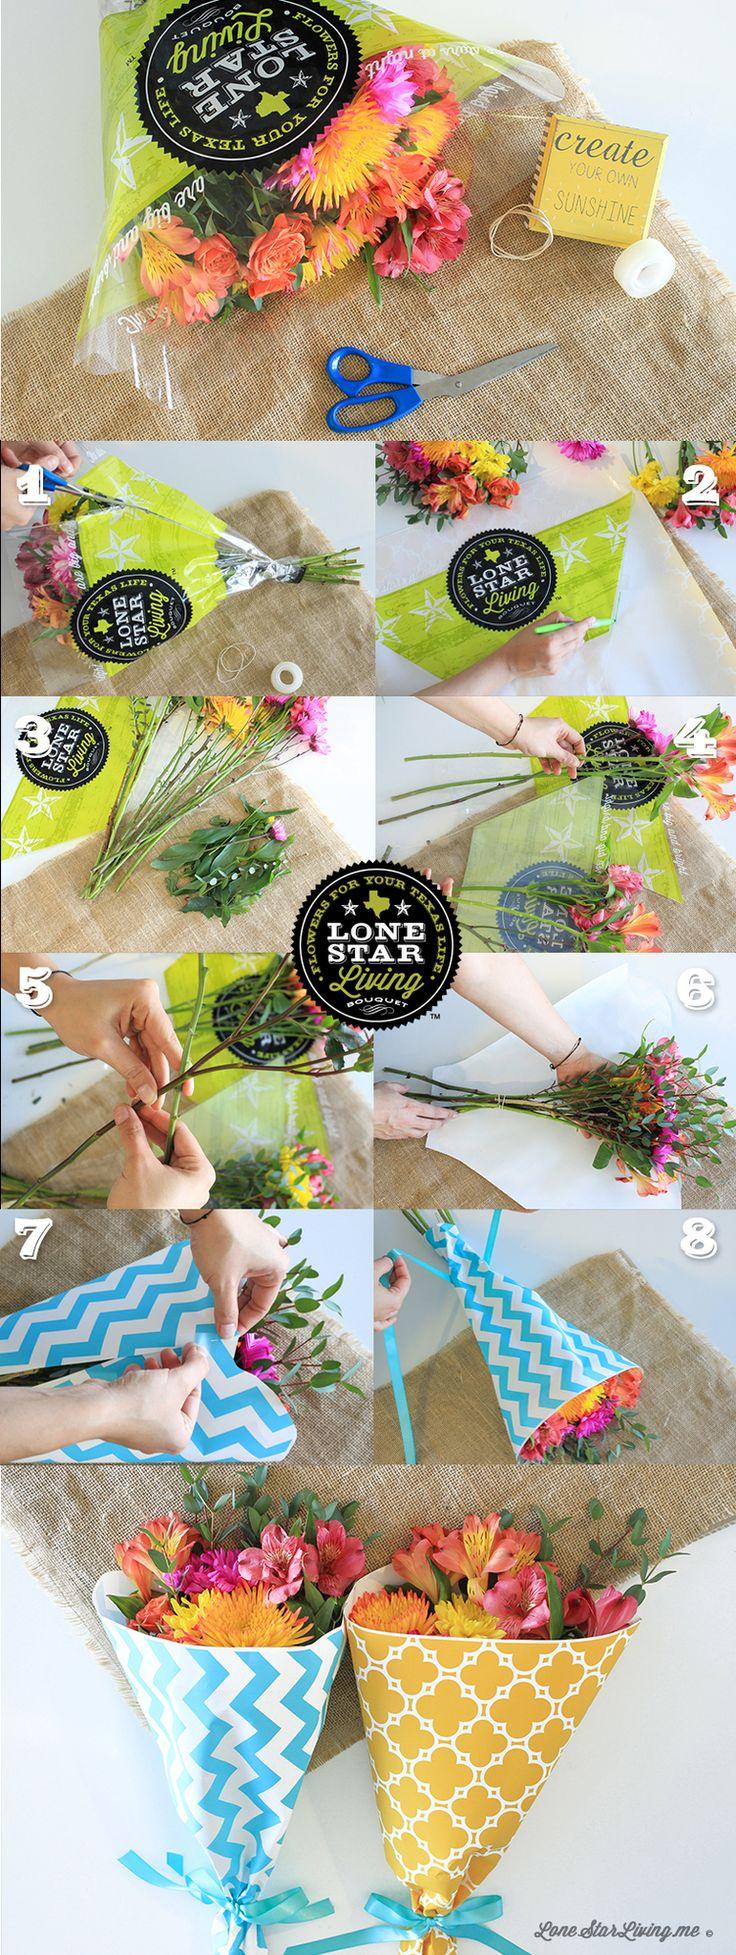 28 best DIY fresh flower projects images on Pinterest ...